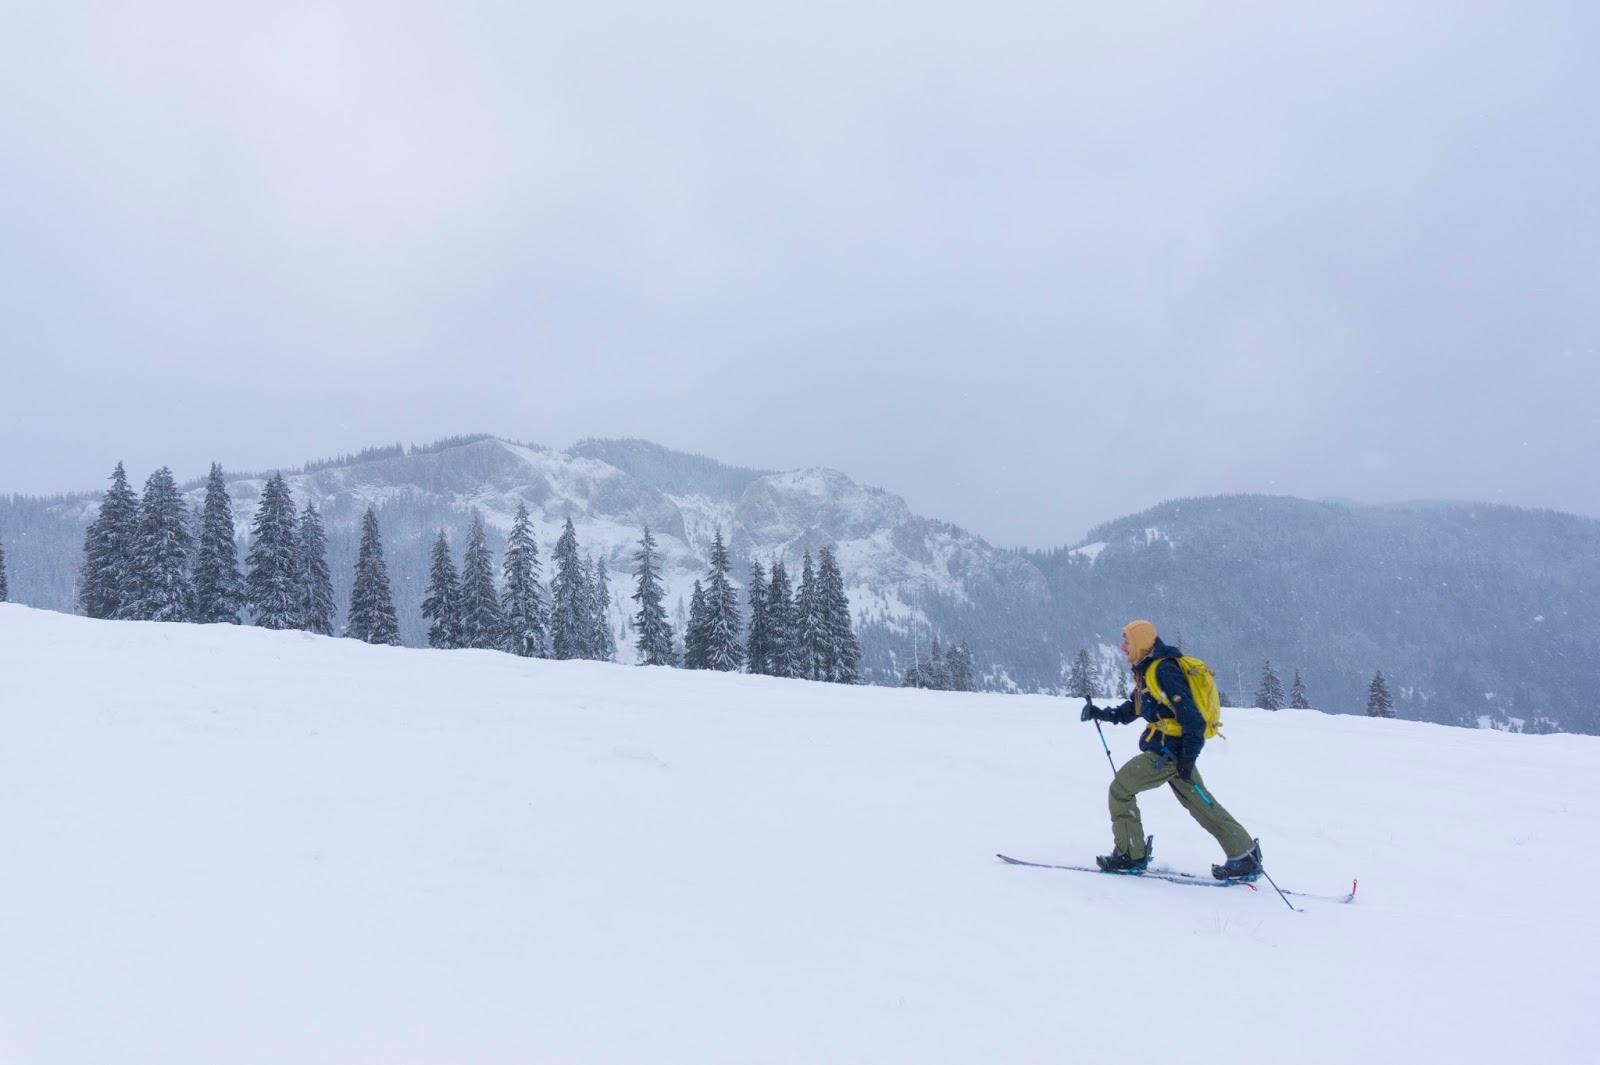 Mersul pe schi de tura  - Alina Cirja - Banda Rosie